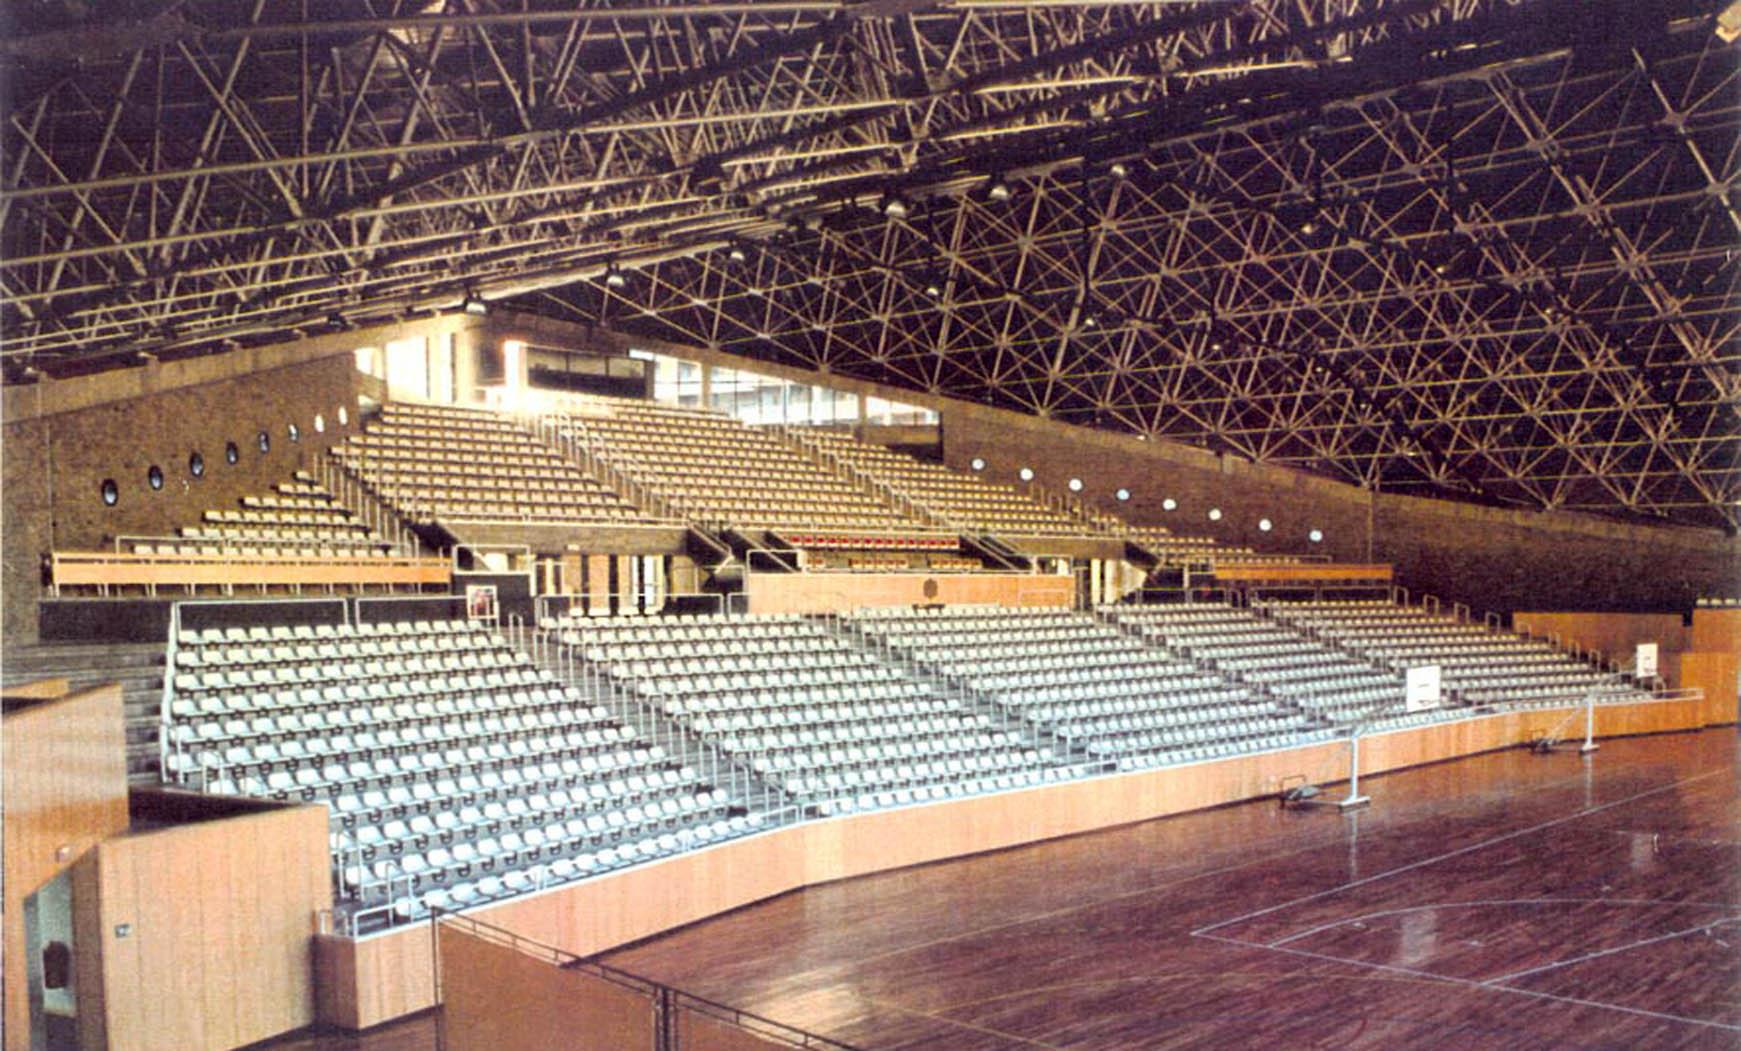 Pabellón polideportivo en Andorra (1988), en colaboración con Francesc Mitjans y SCB